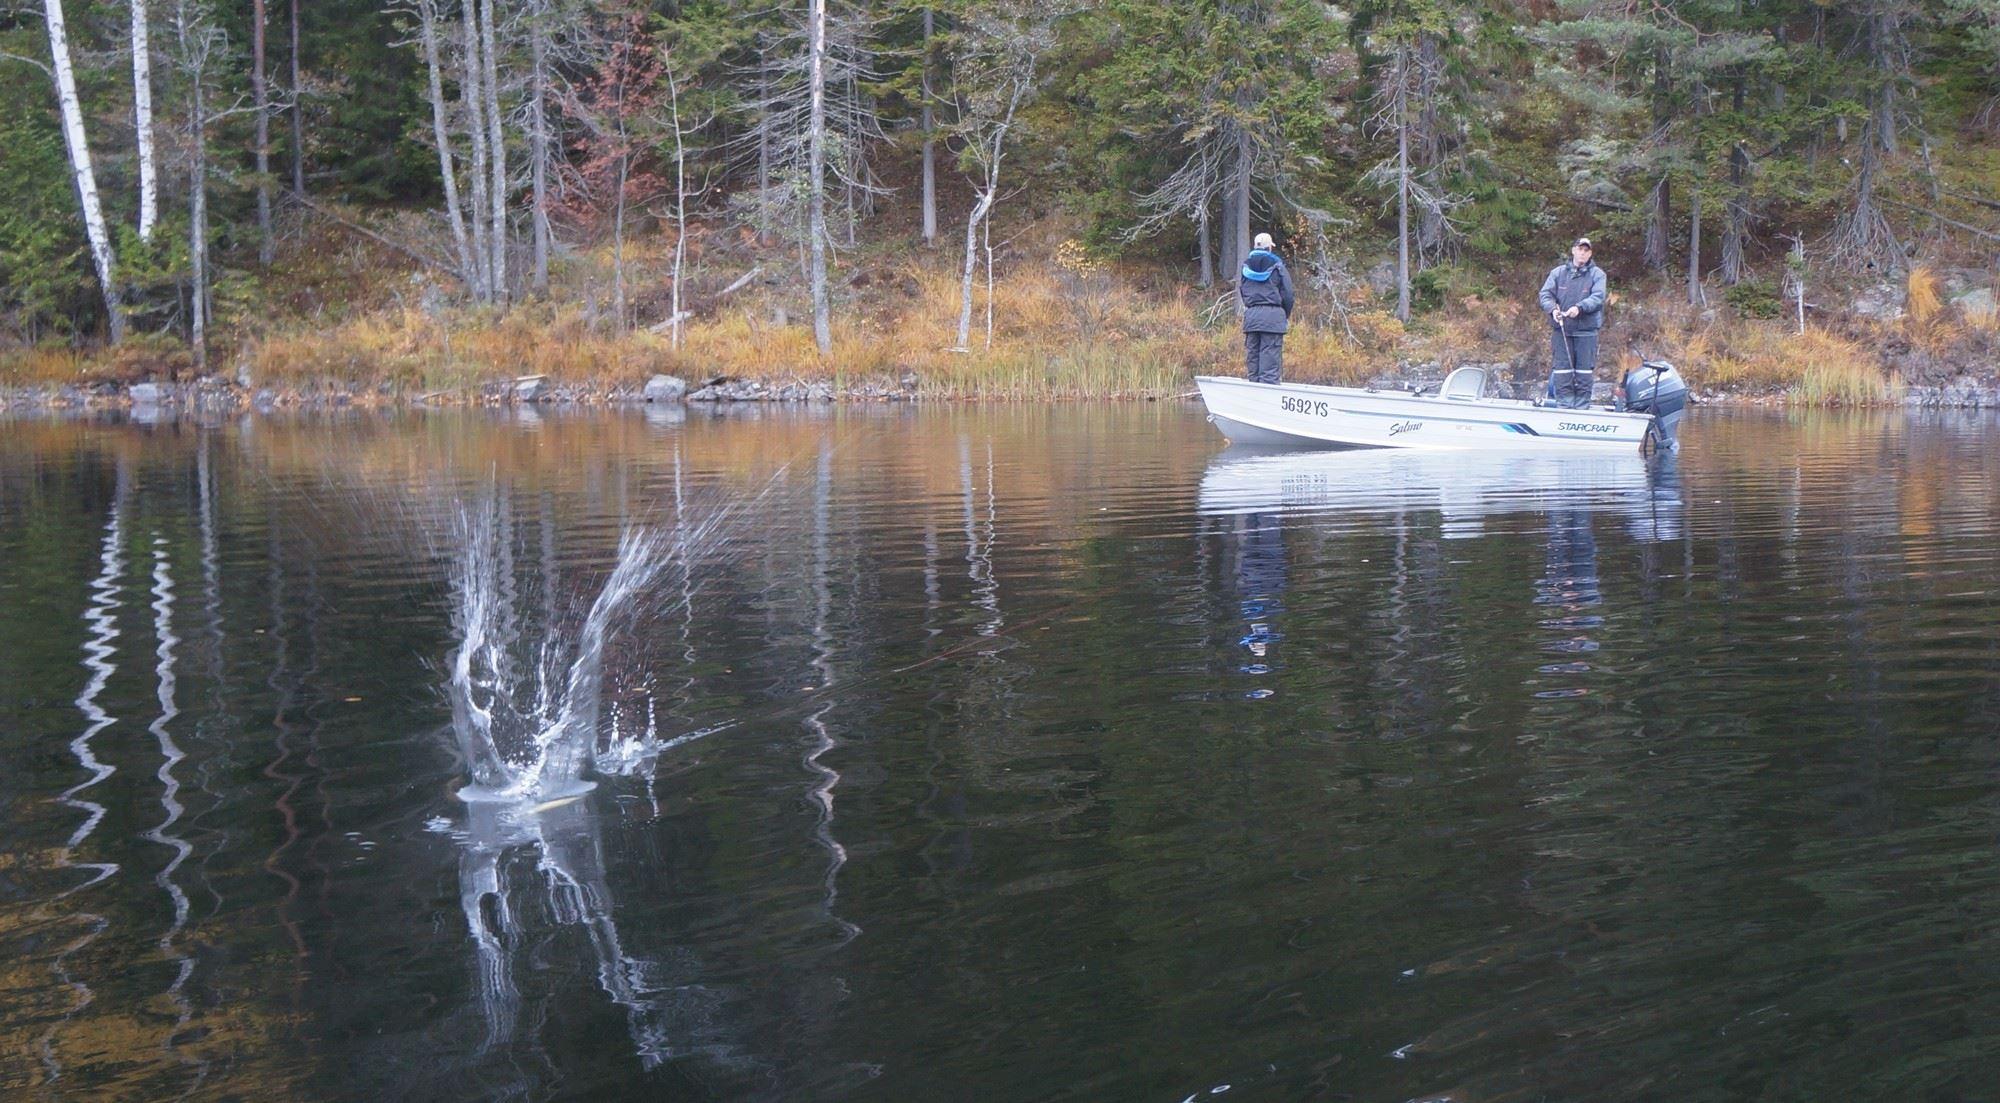 Andy Van Assema,  © Andy Van Assema, Spinnfiske i sjön Edslan i Dalsland